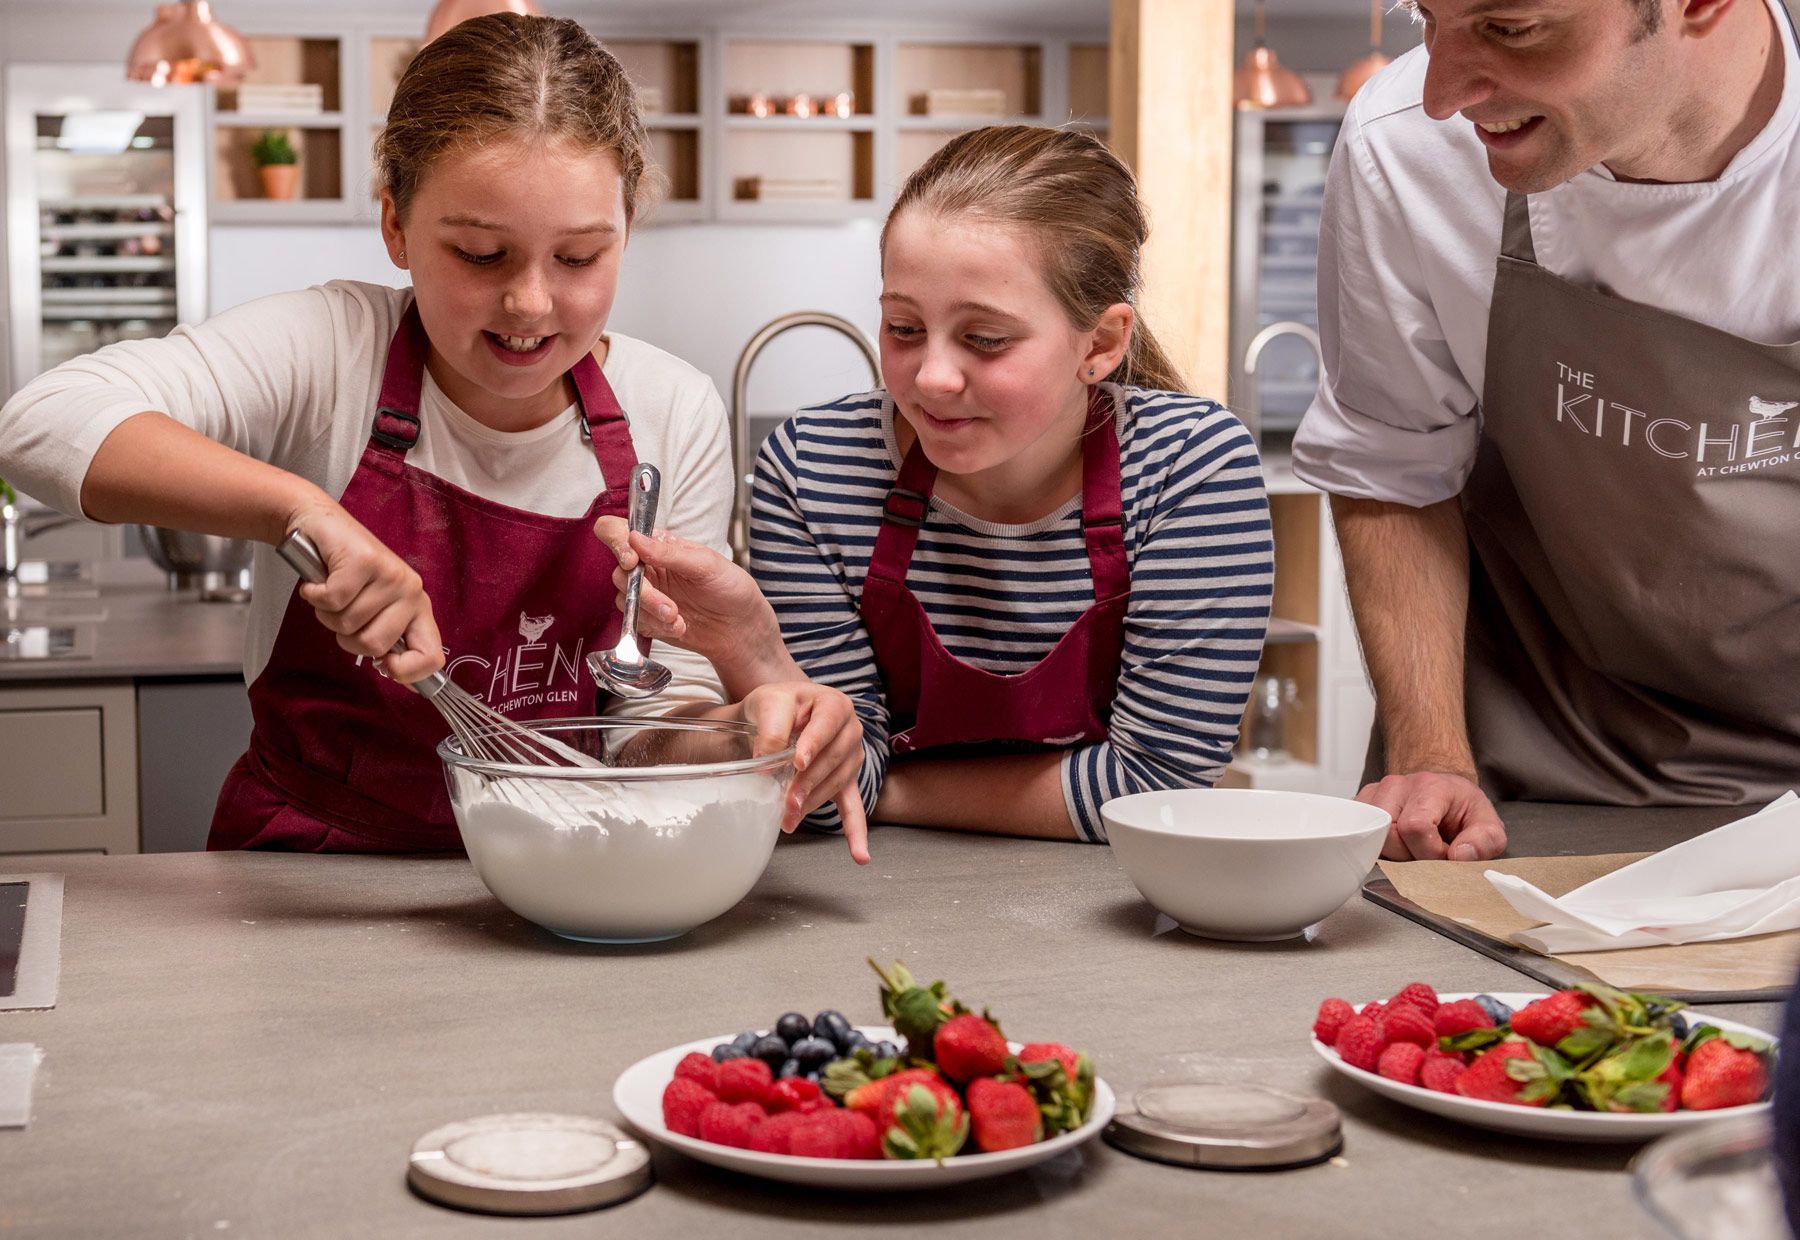 Chewton Glen's New Cookery School & Dining Complex Opening Soon